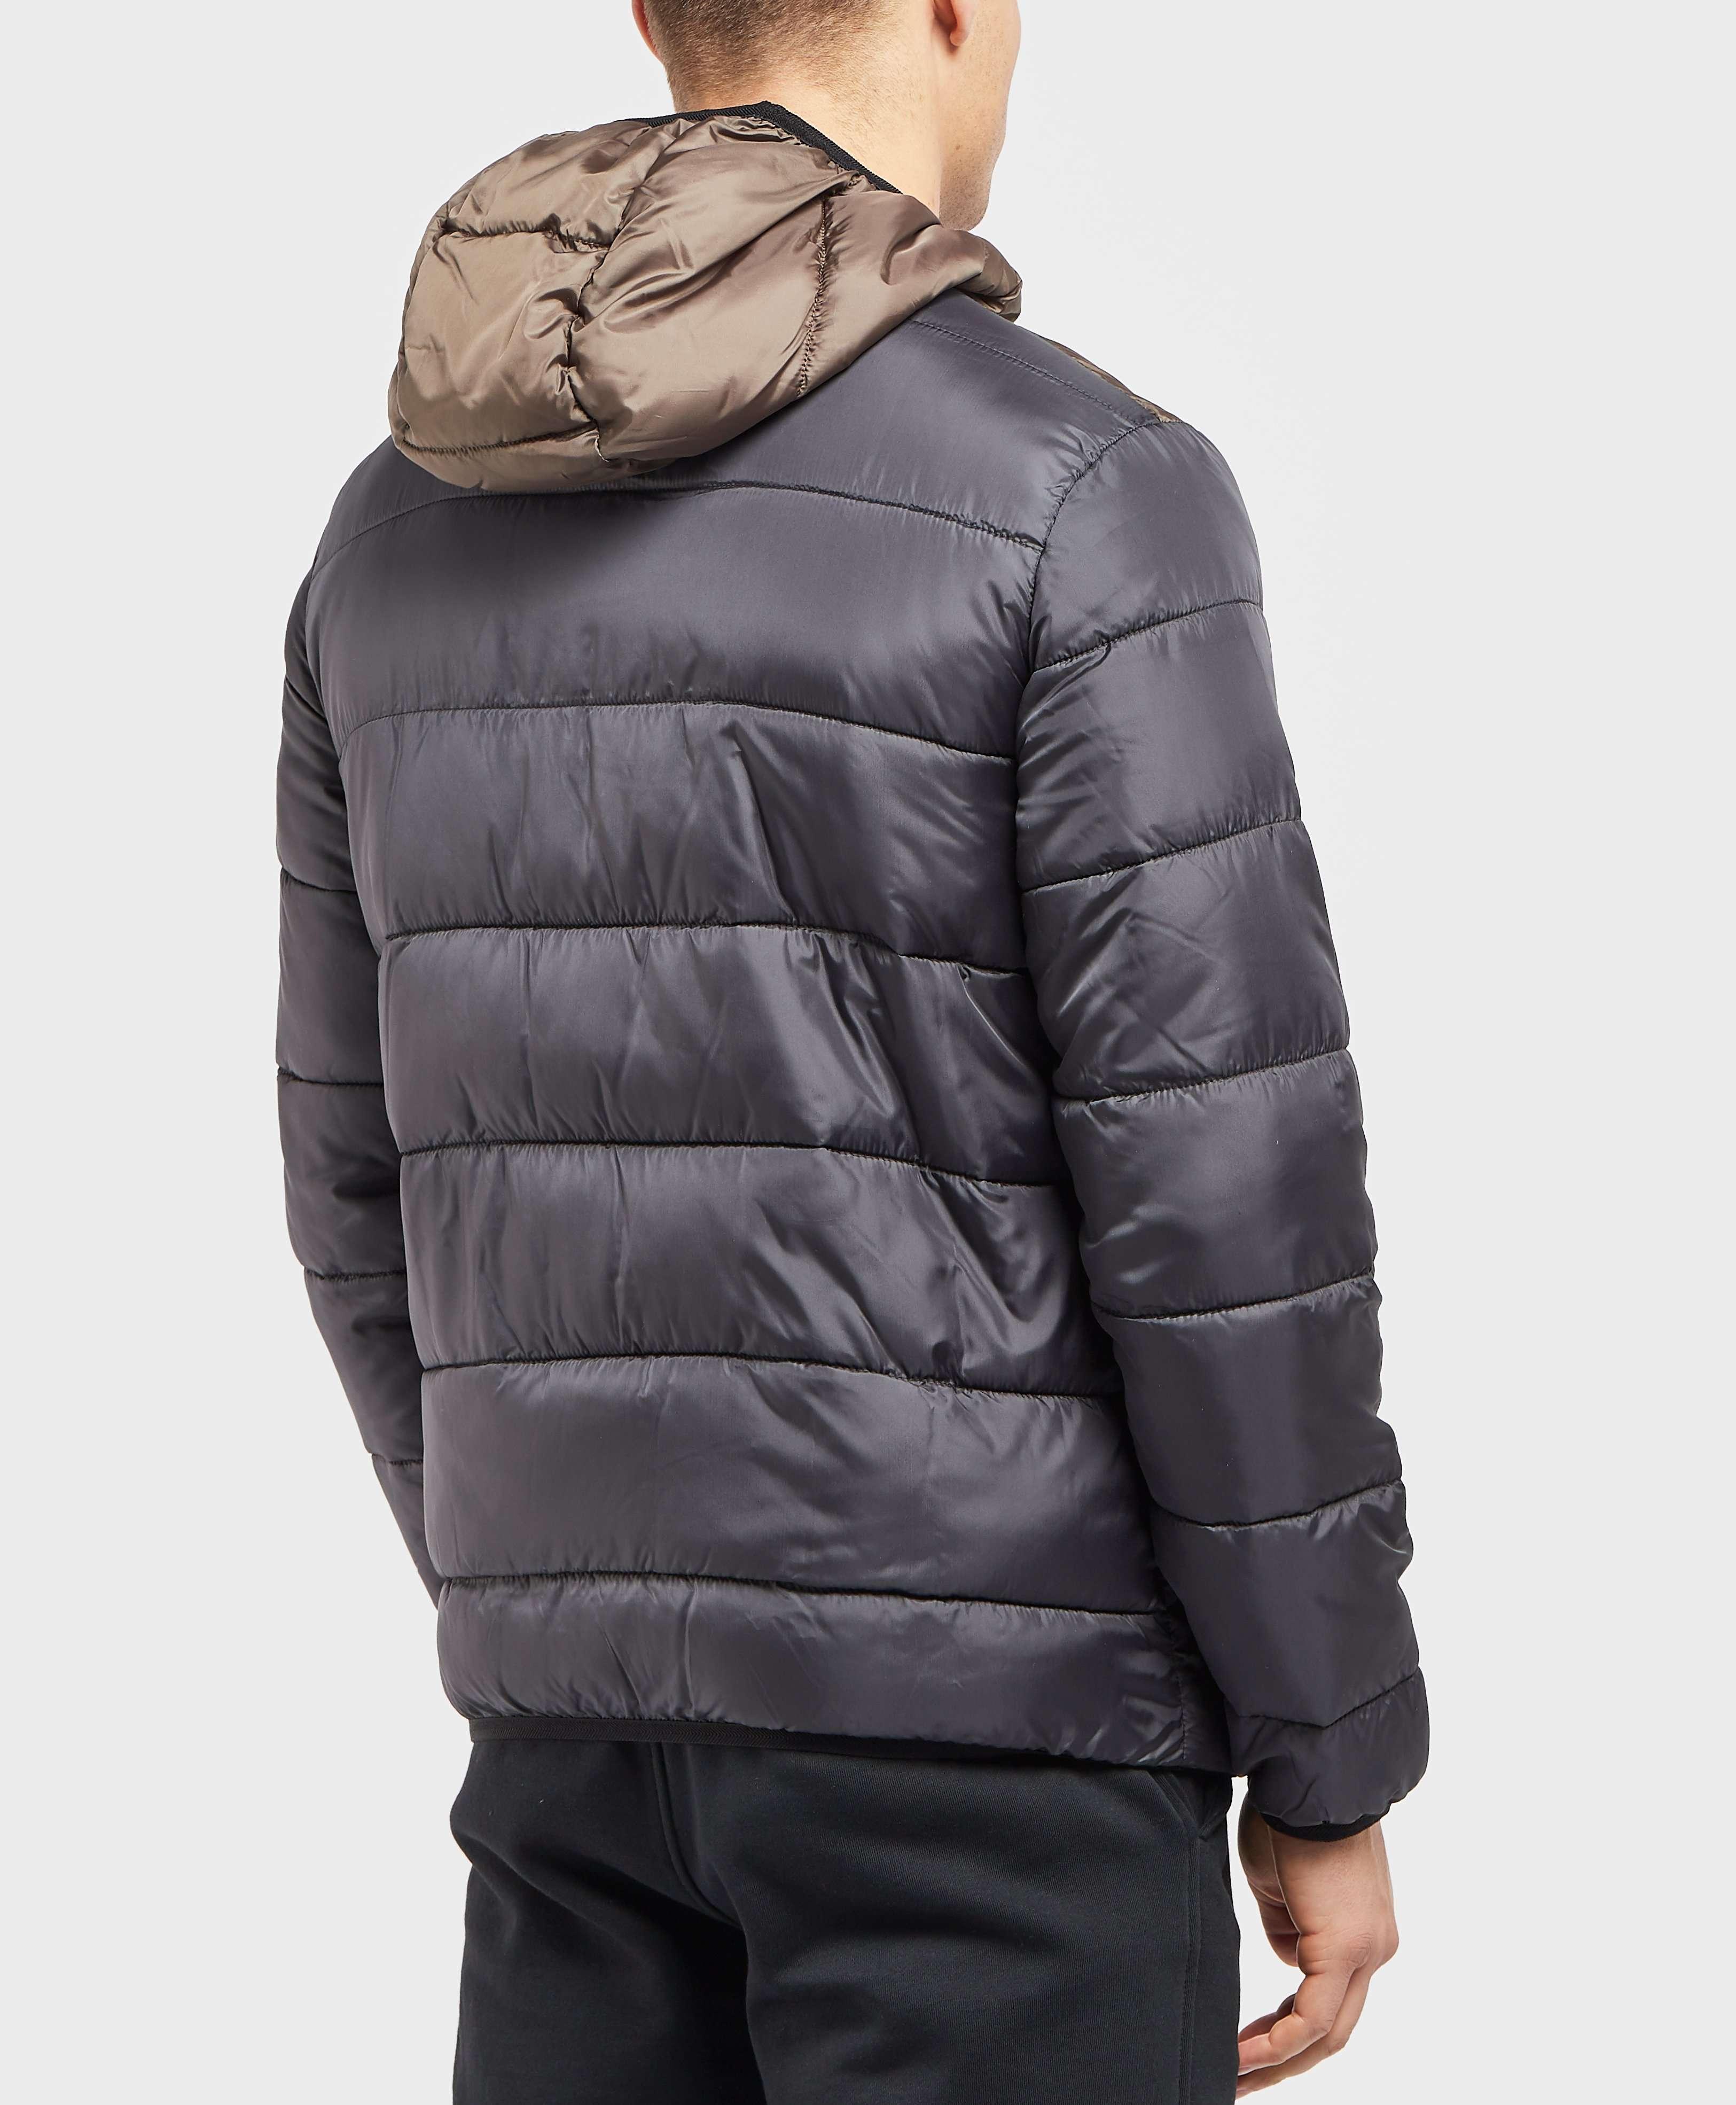 Emporio Armani EA7 Mountain Tritone Padded jacket